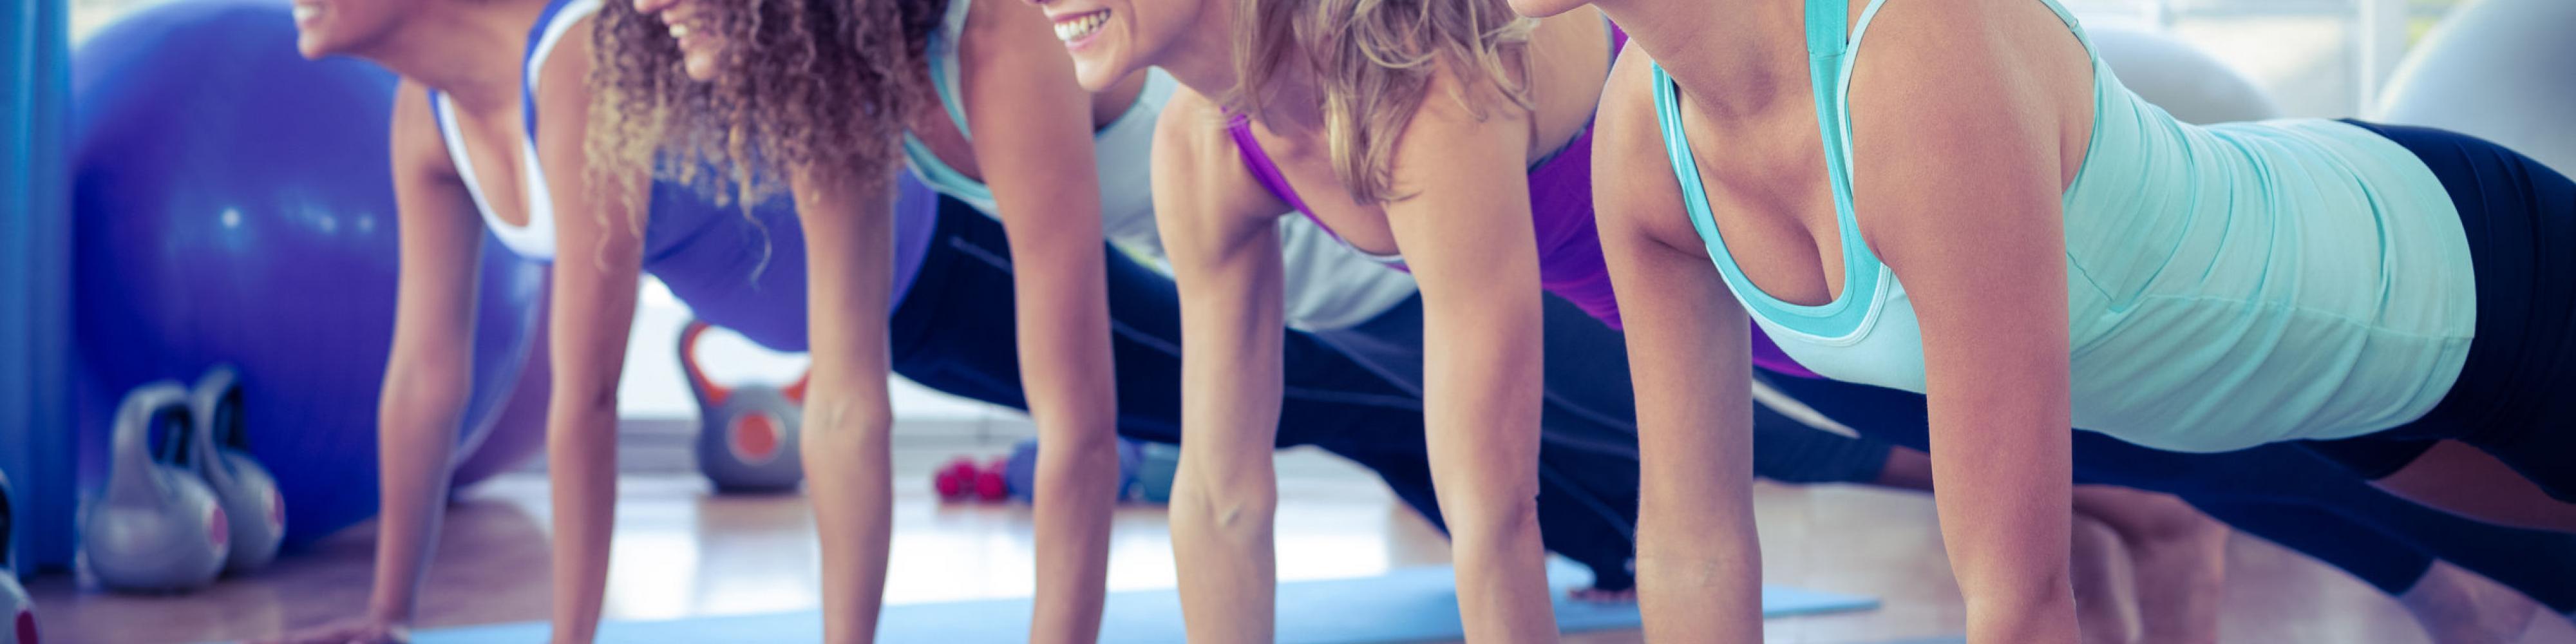 Yogafit Gemmy Tebben Mind en Body Actief Emmen Sleen Coevorden